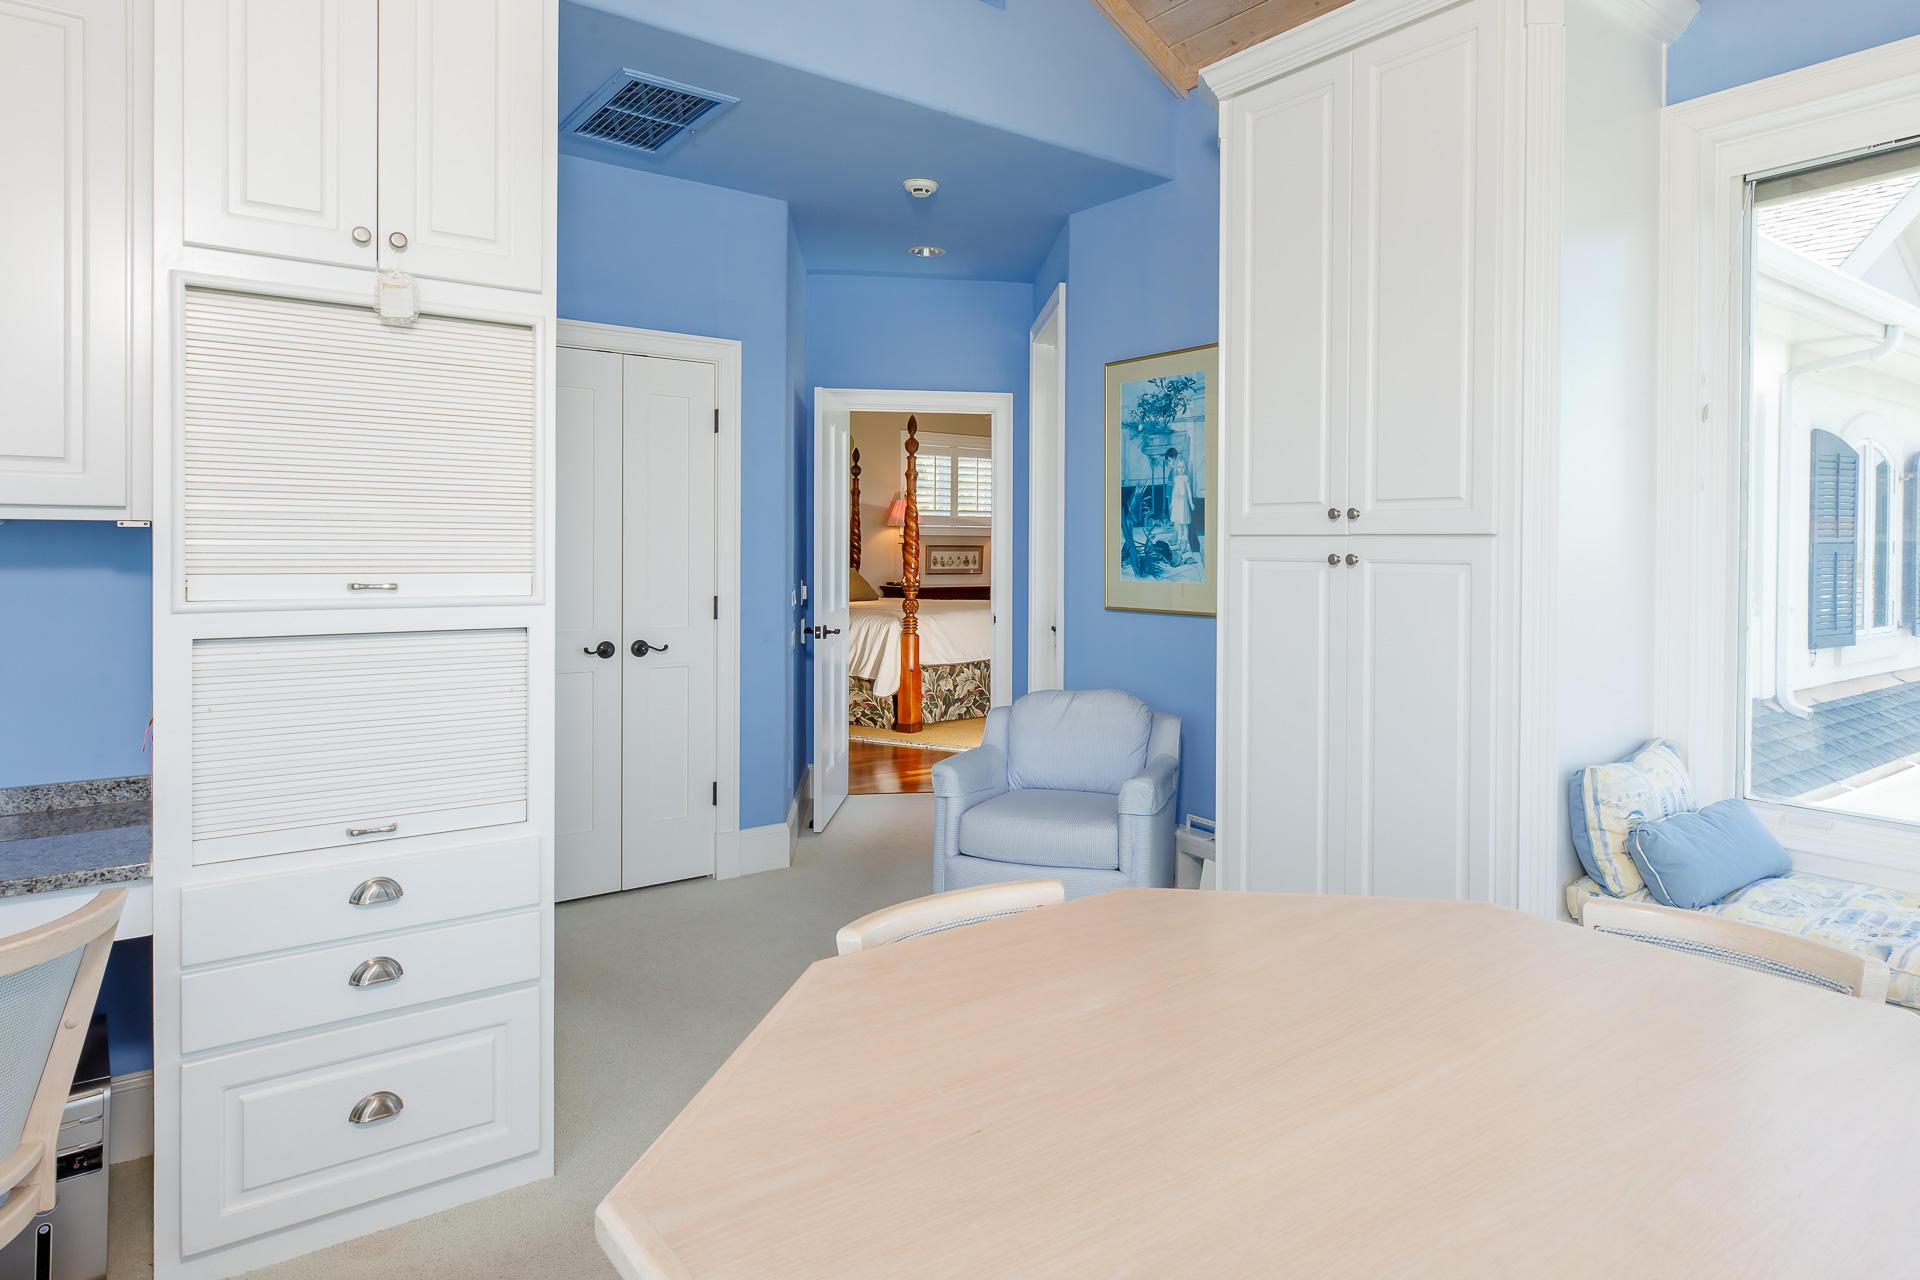 Seabrook Island Homes For Sale - 2216 Rolling Dune, Seabrook Island, SC - 79